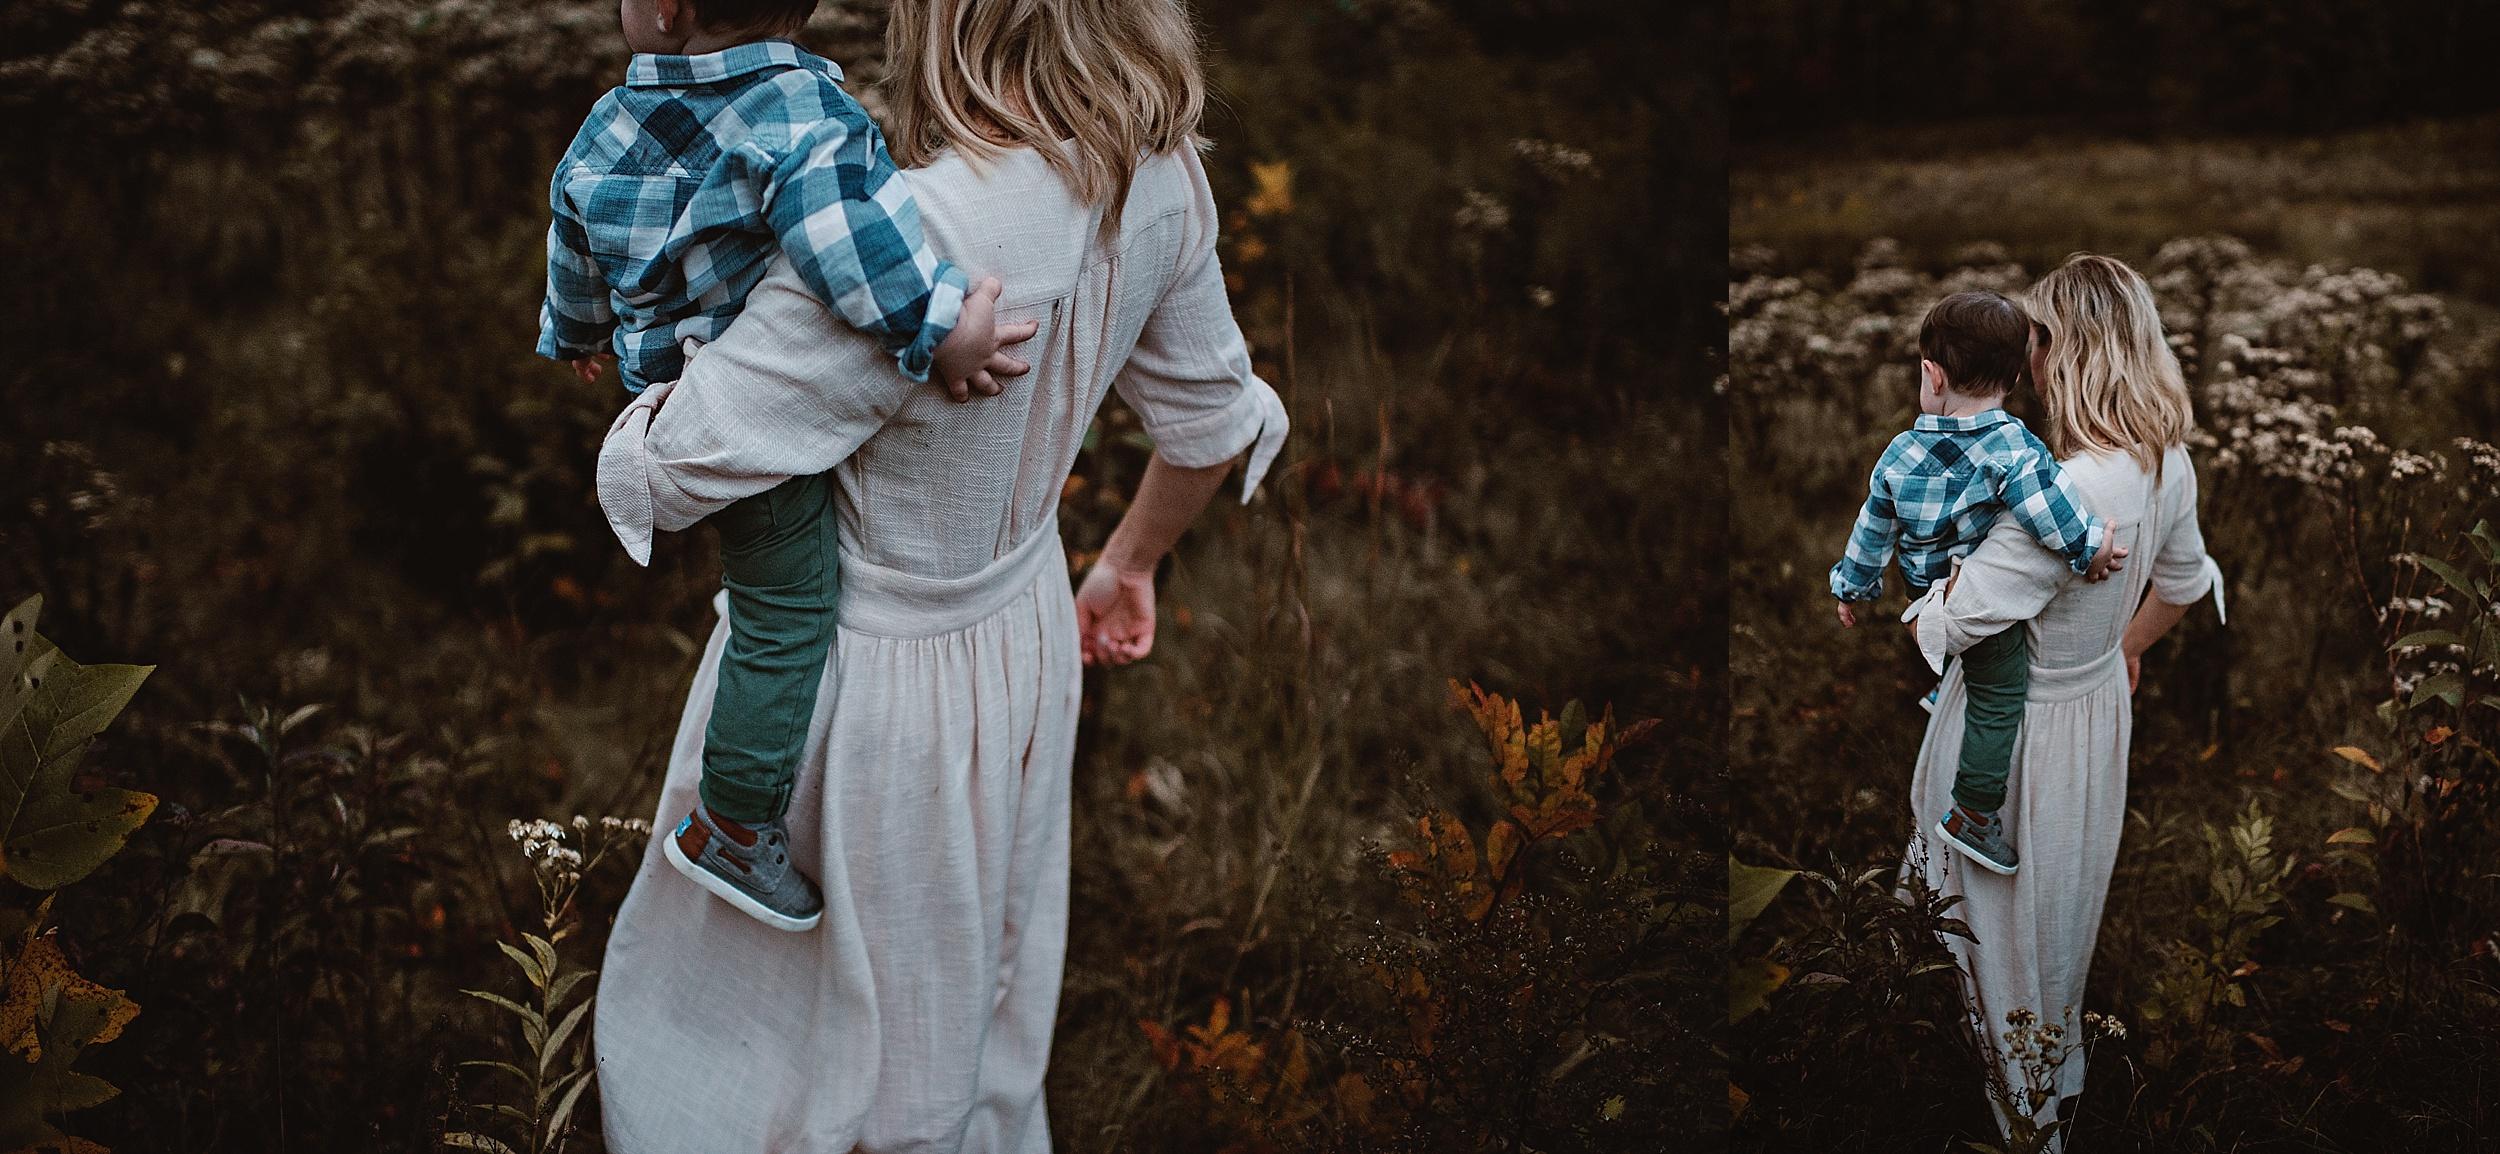 lauren-grayson-photography-portrait-artist-akron-cleveland-ohio-photographer-family-session-fields-sunset-fall_0221.jpg